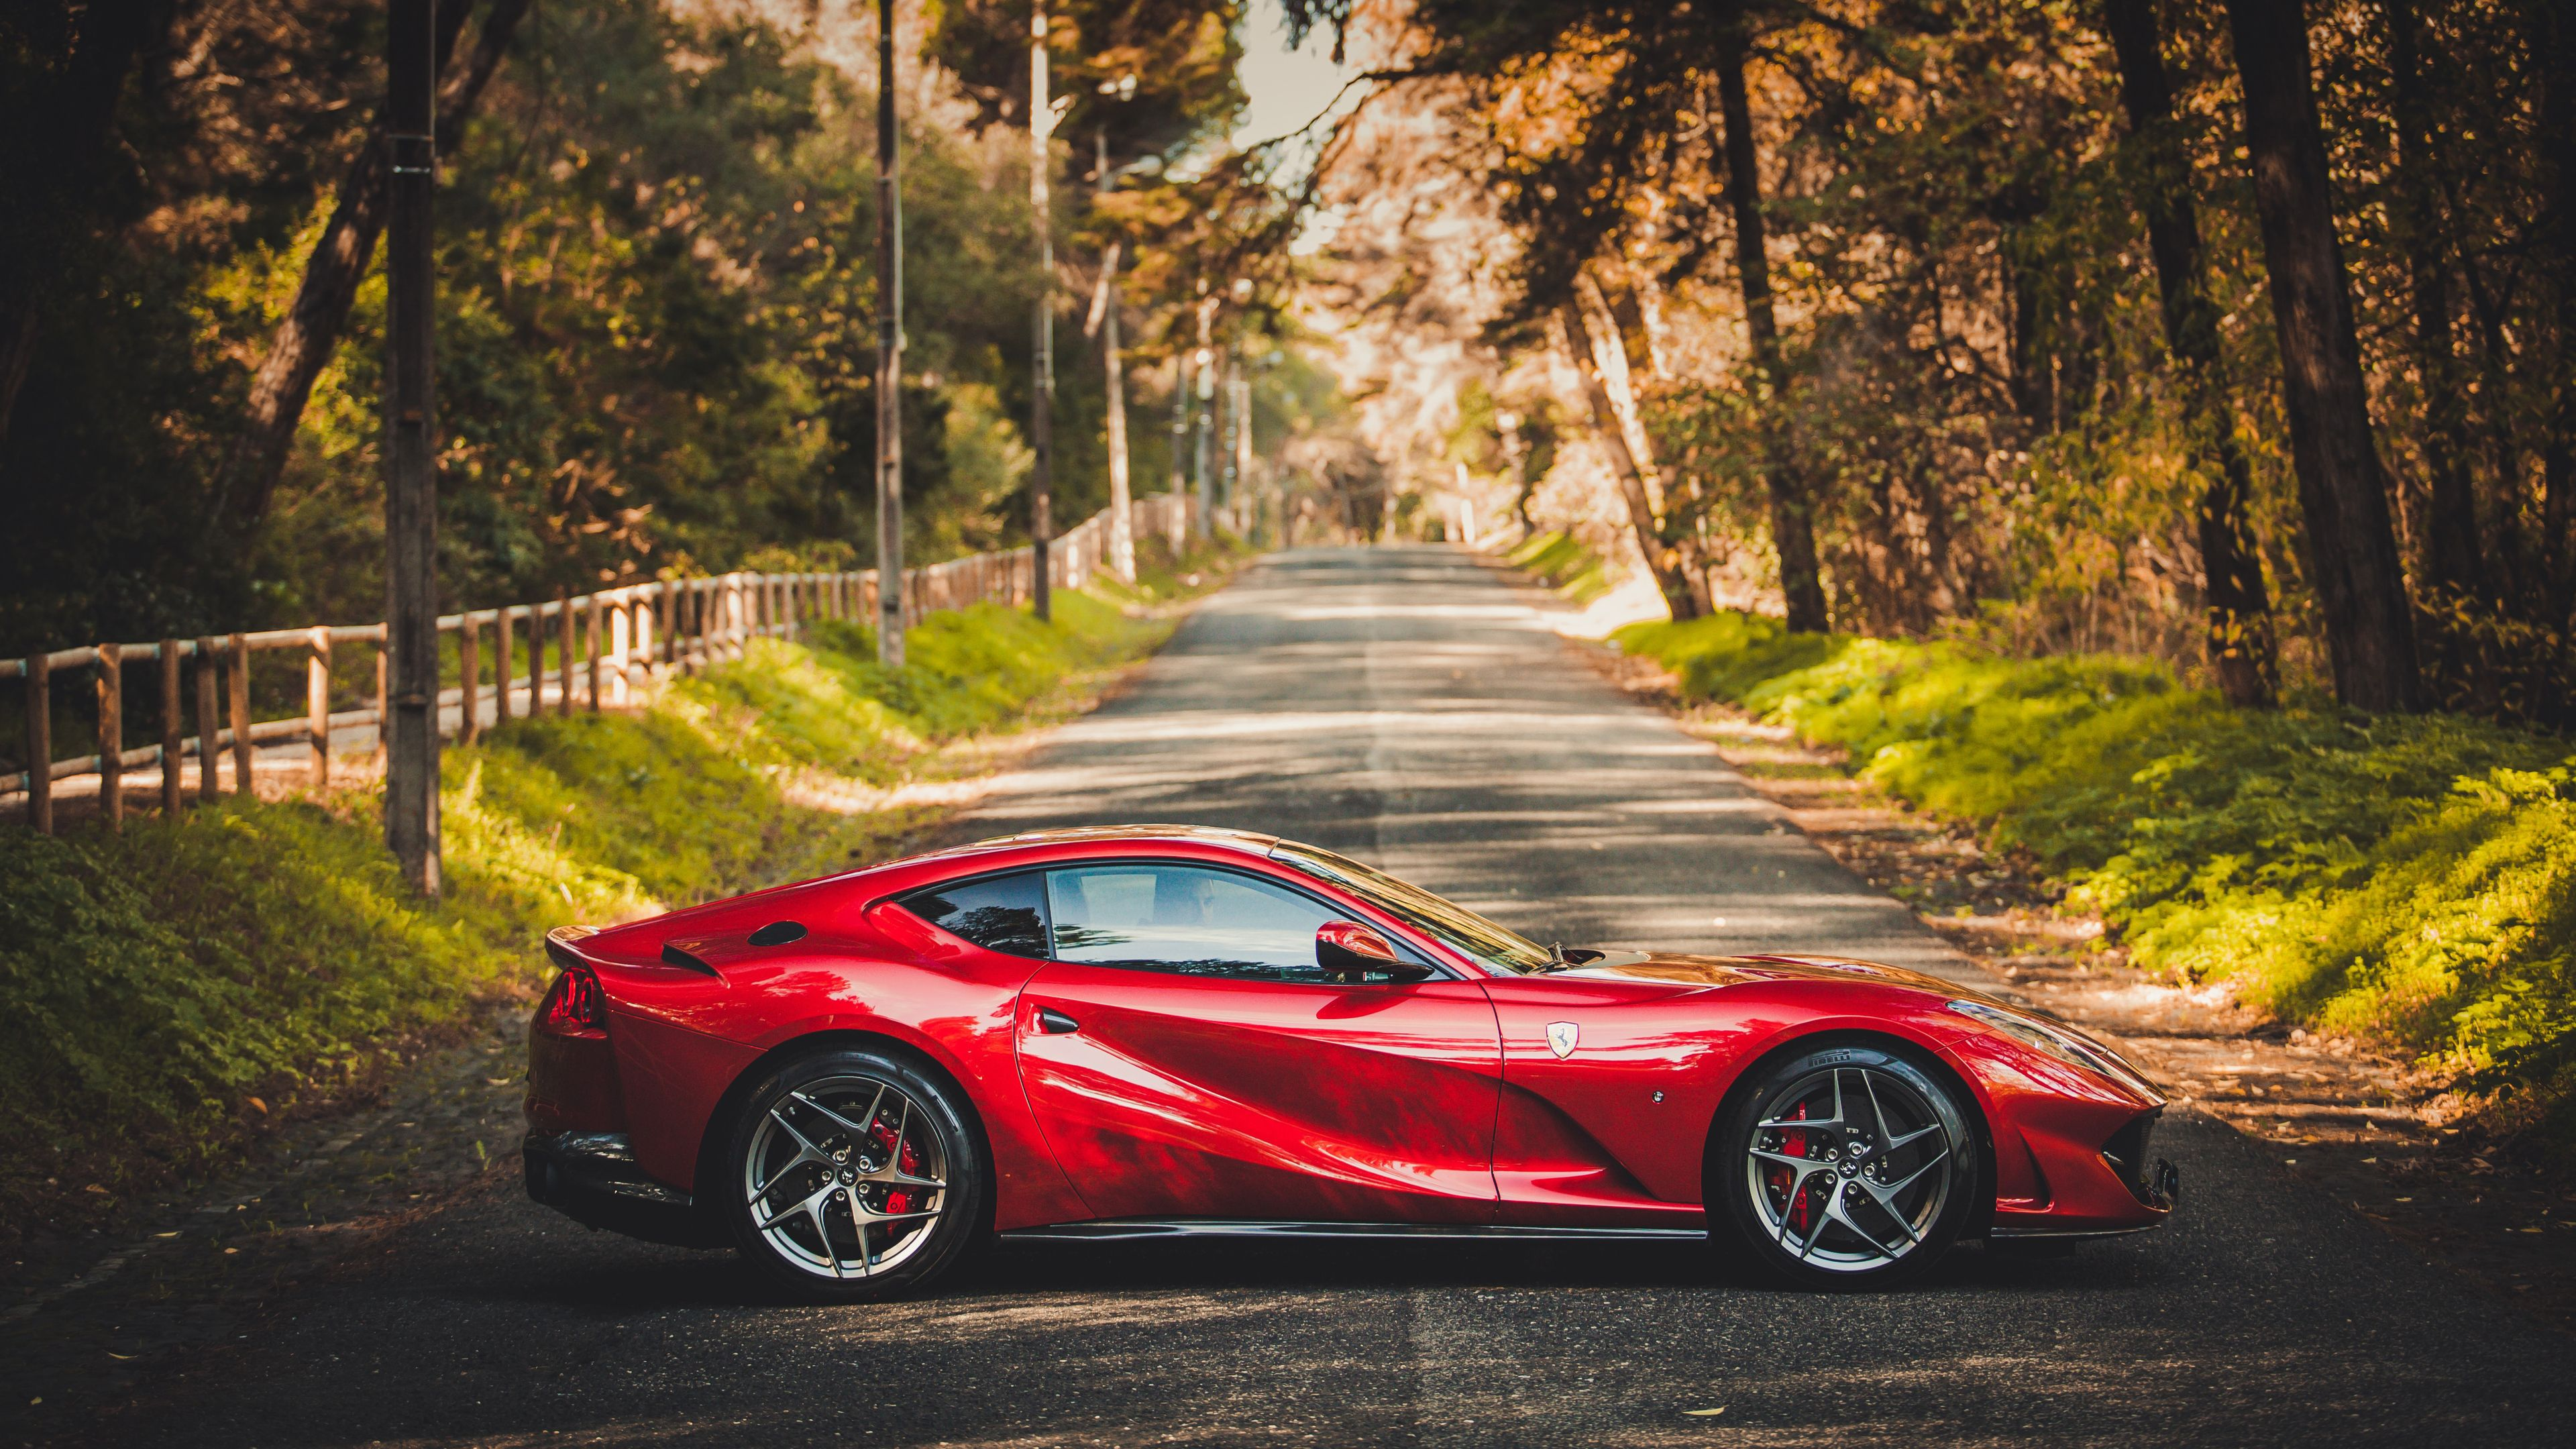 Ferrari Wallpaper 4K